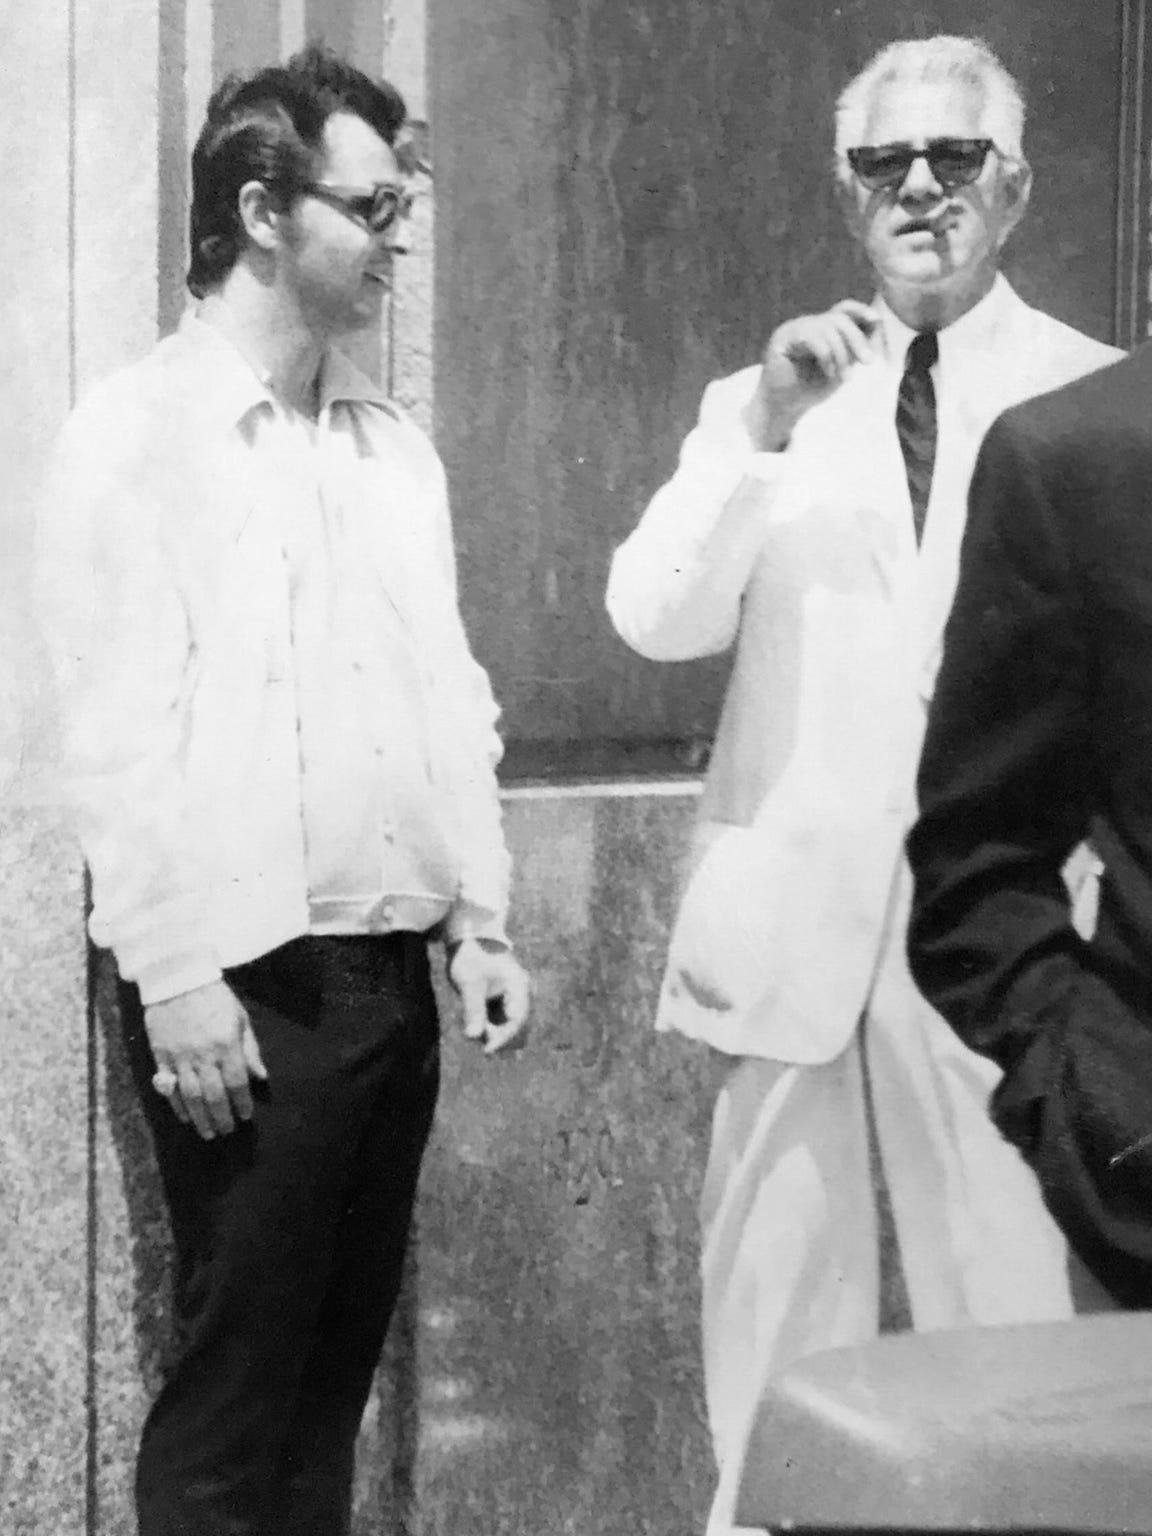 Sammy Gingello, left, and Frank Valenti.